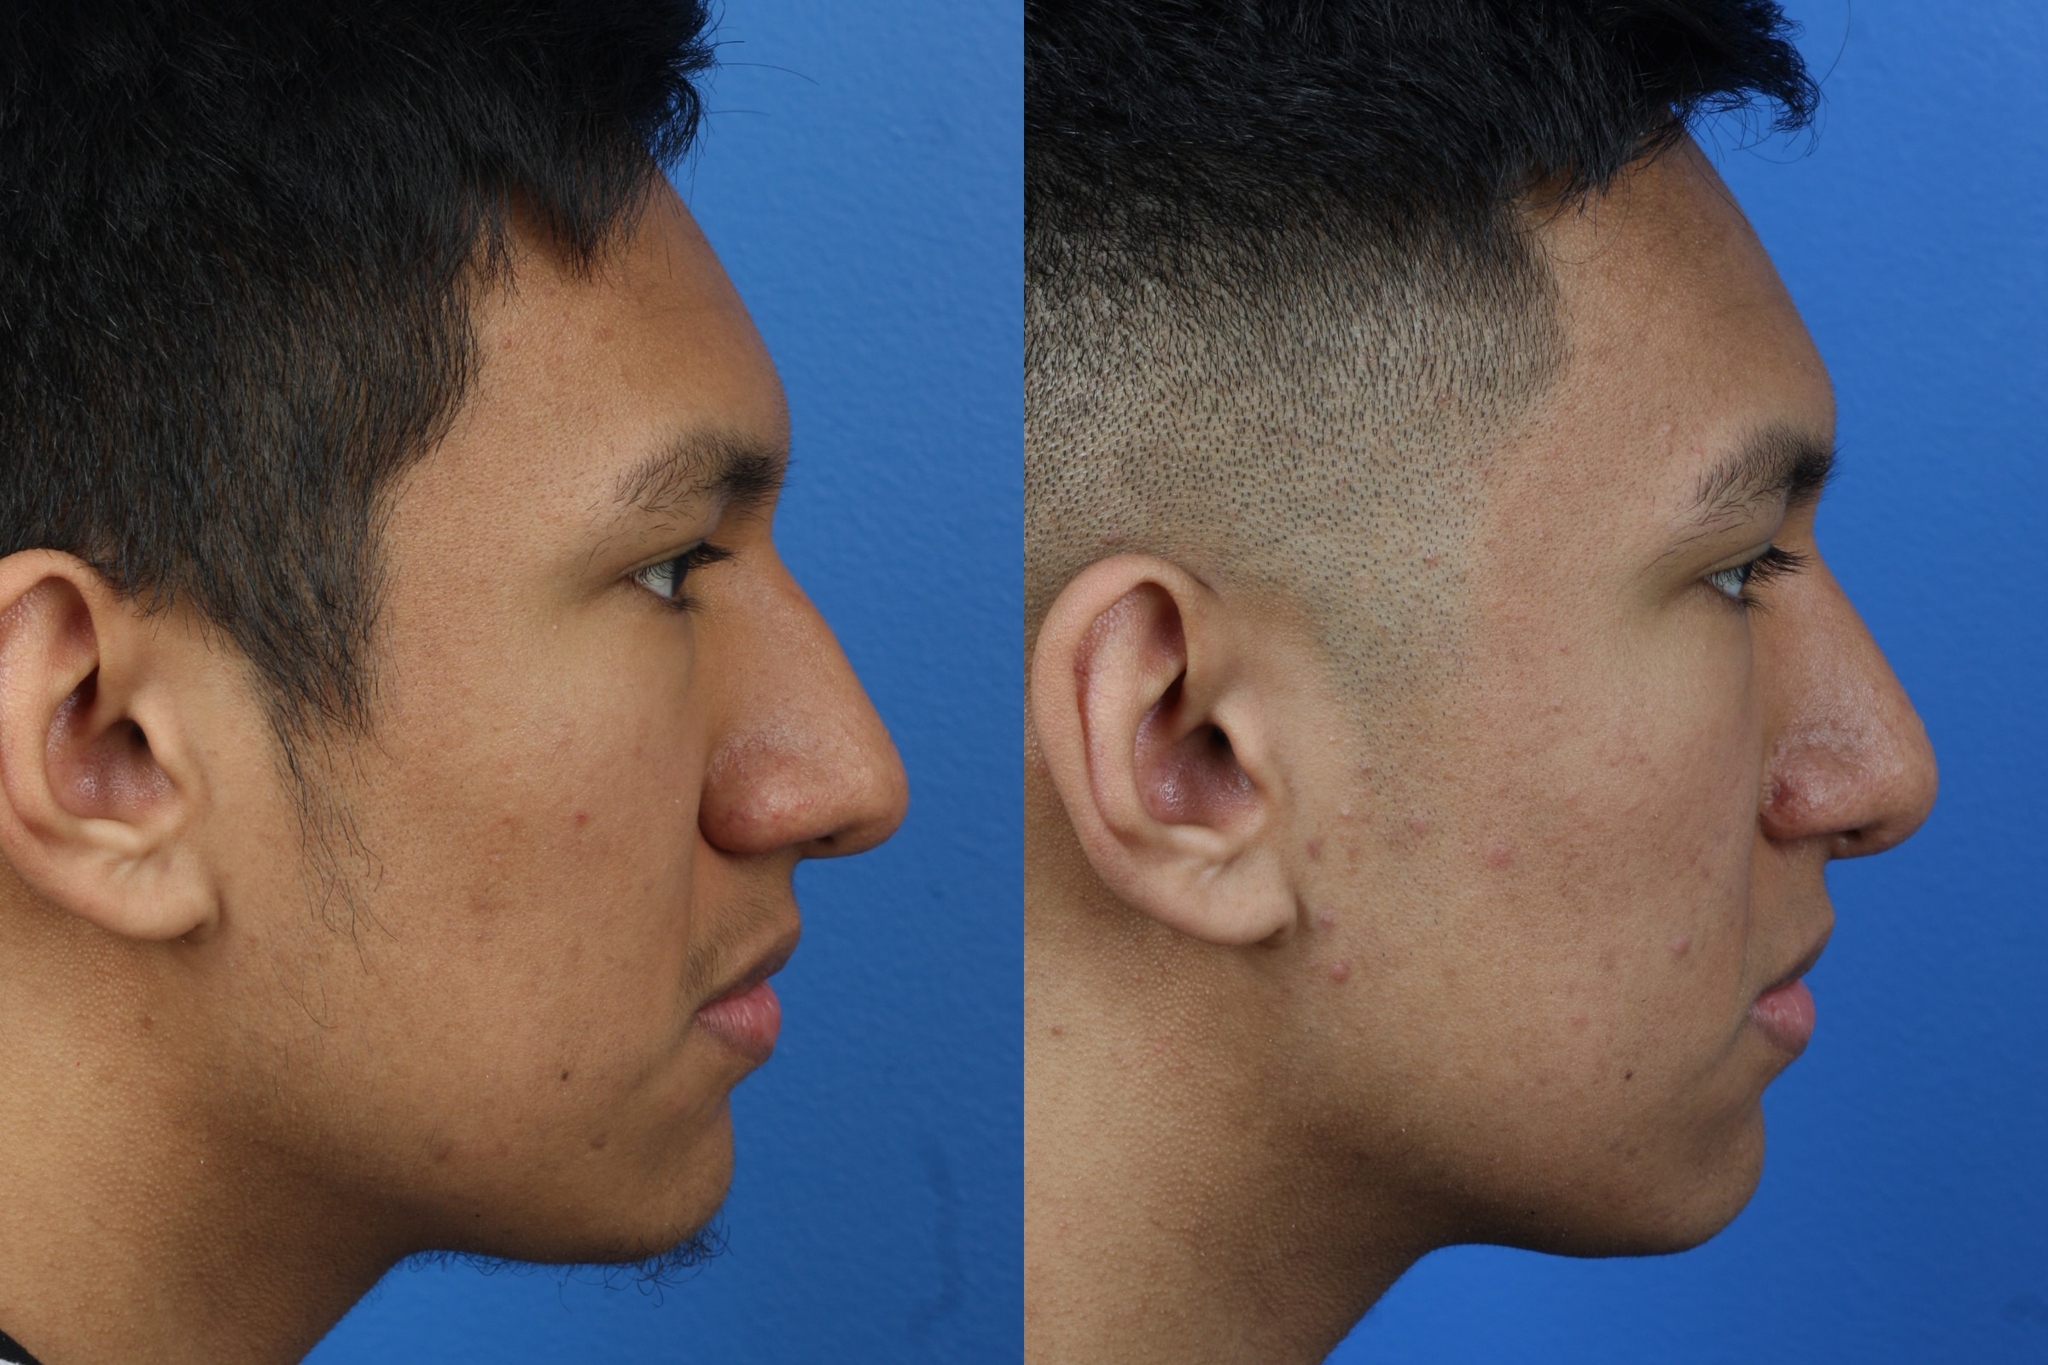 Rhinoplasty to Refine Nasal Bridge by Dr. Miller